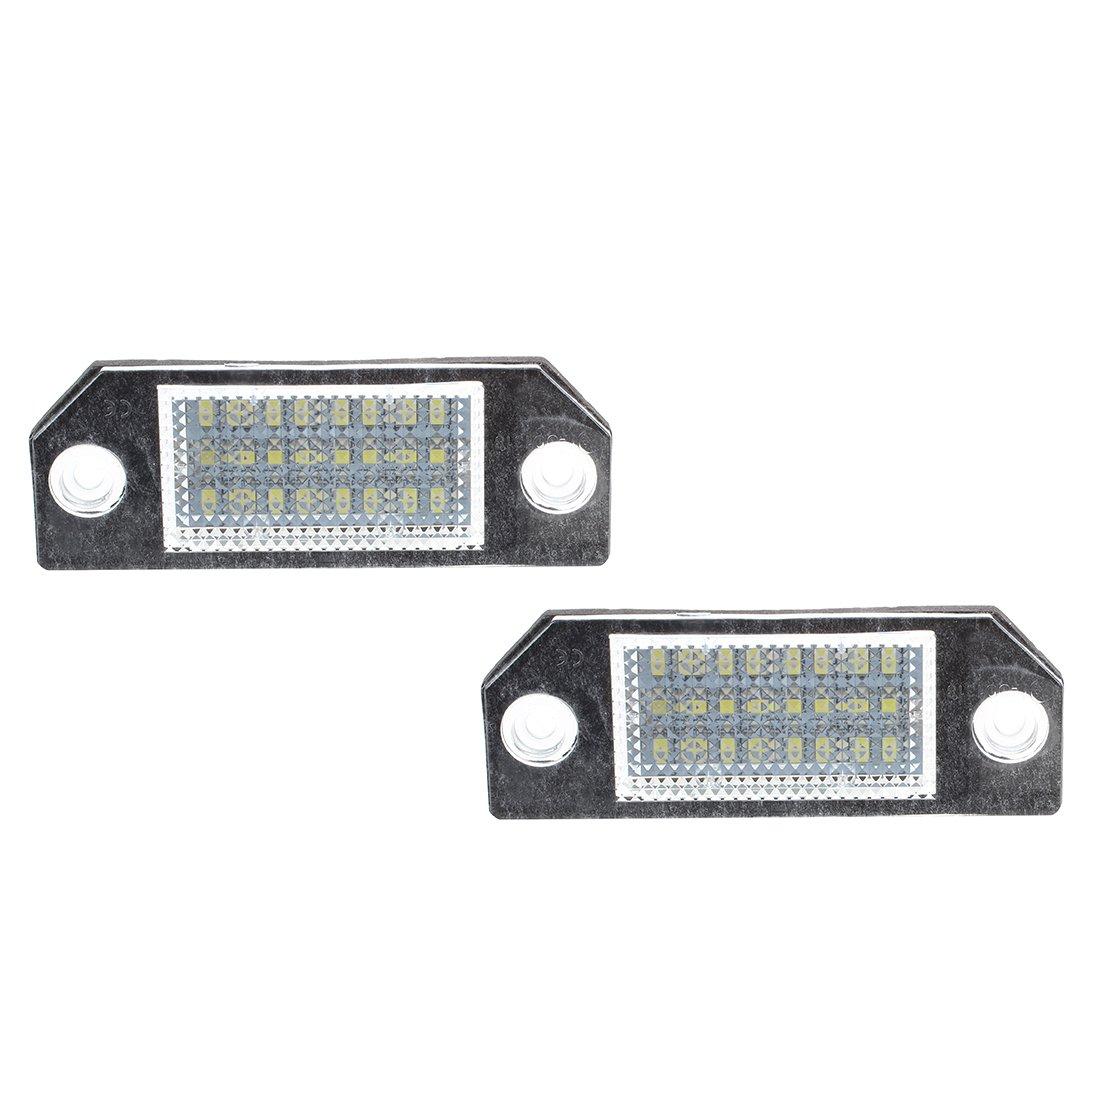 Sonline 22733 Coppia Luci Targa 24 LED Bianco